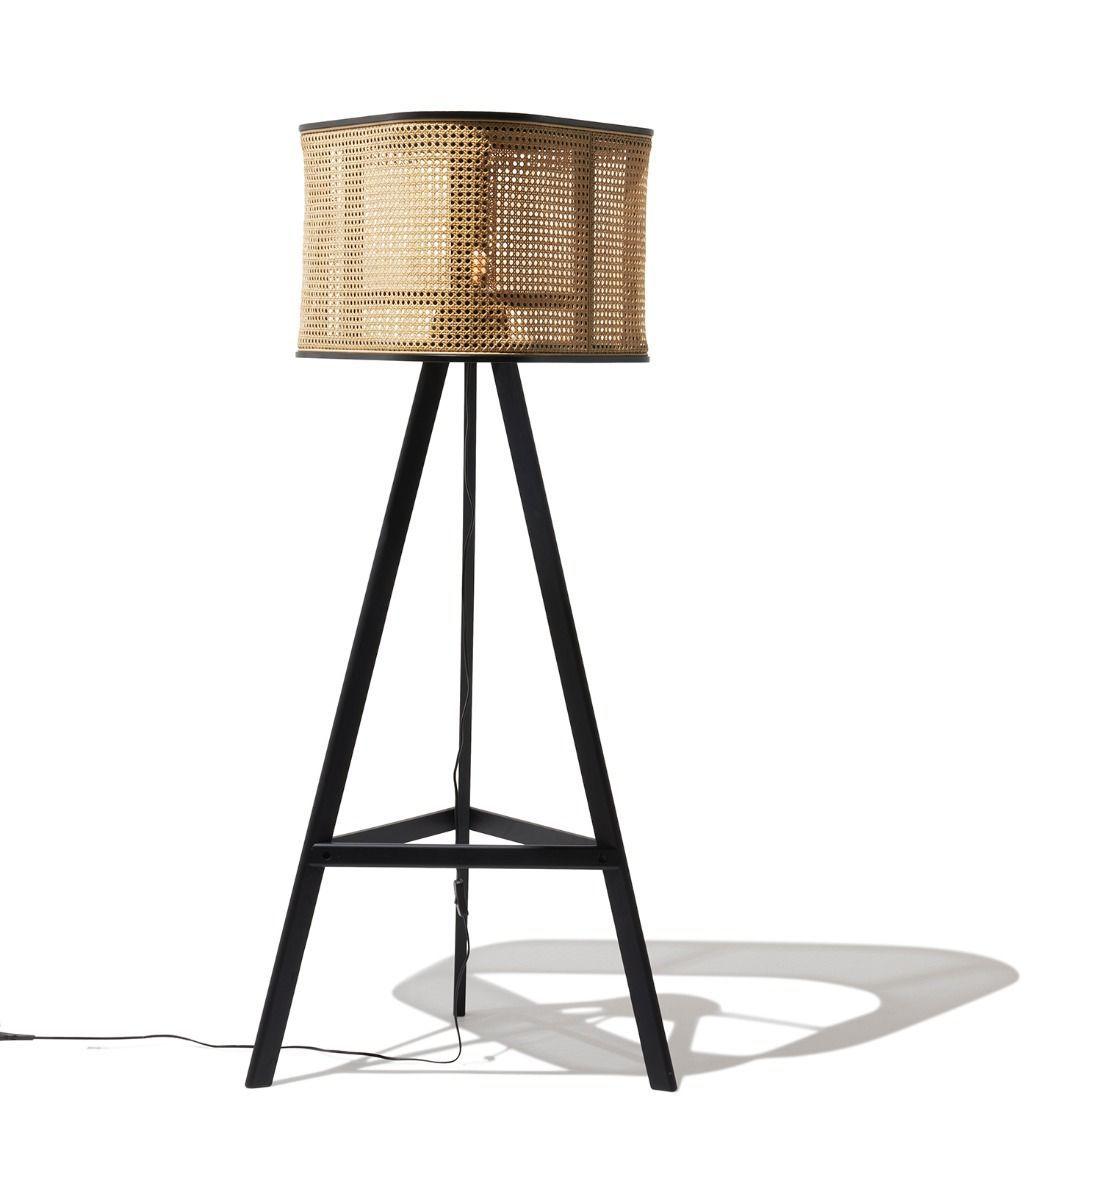 Industry West Cane Floor Lamp